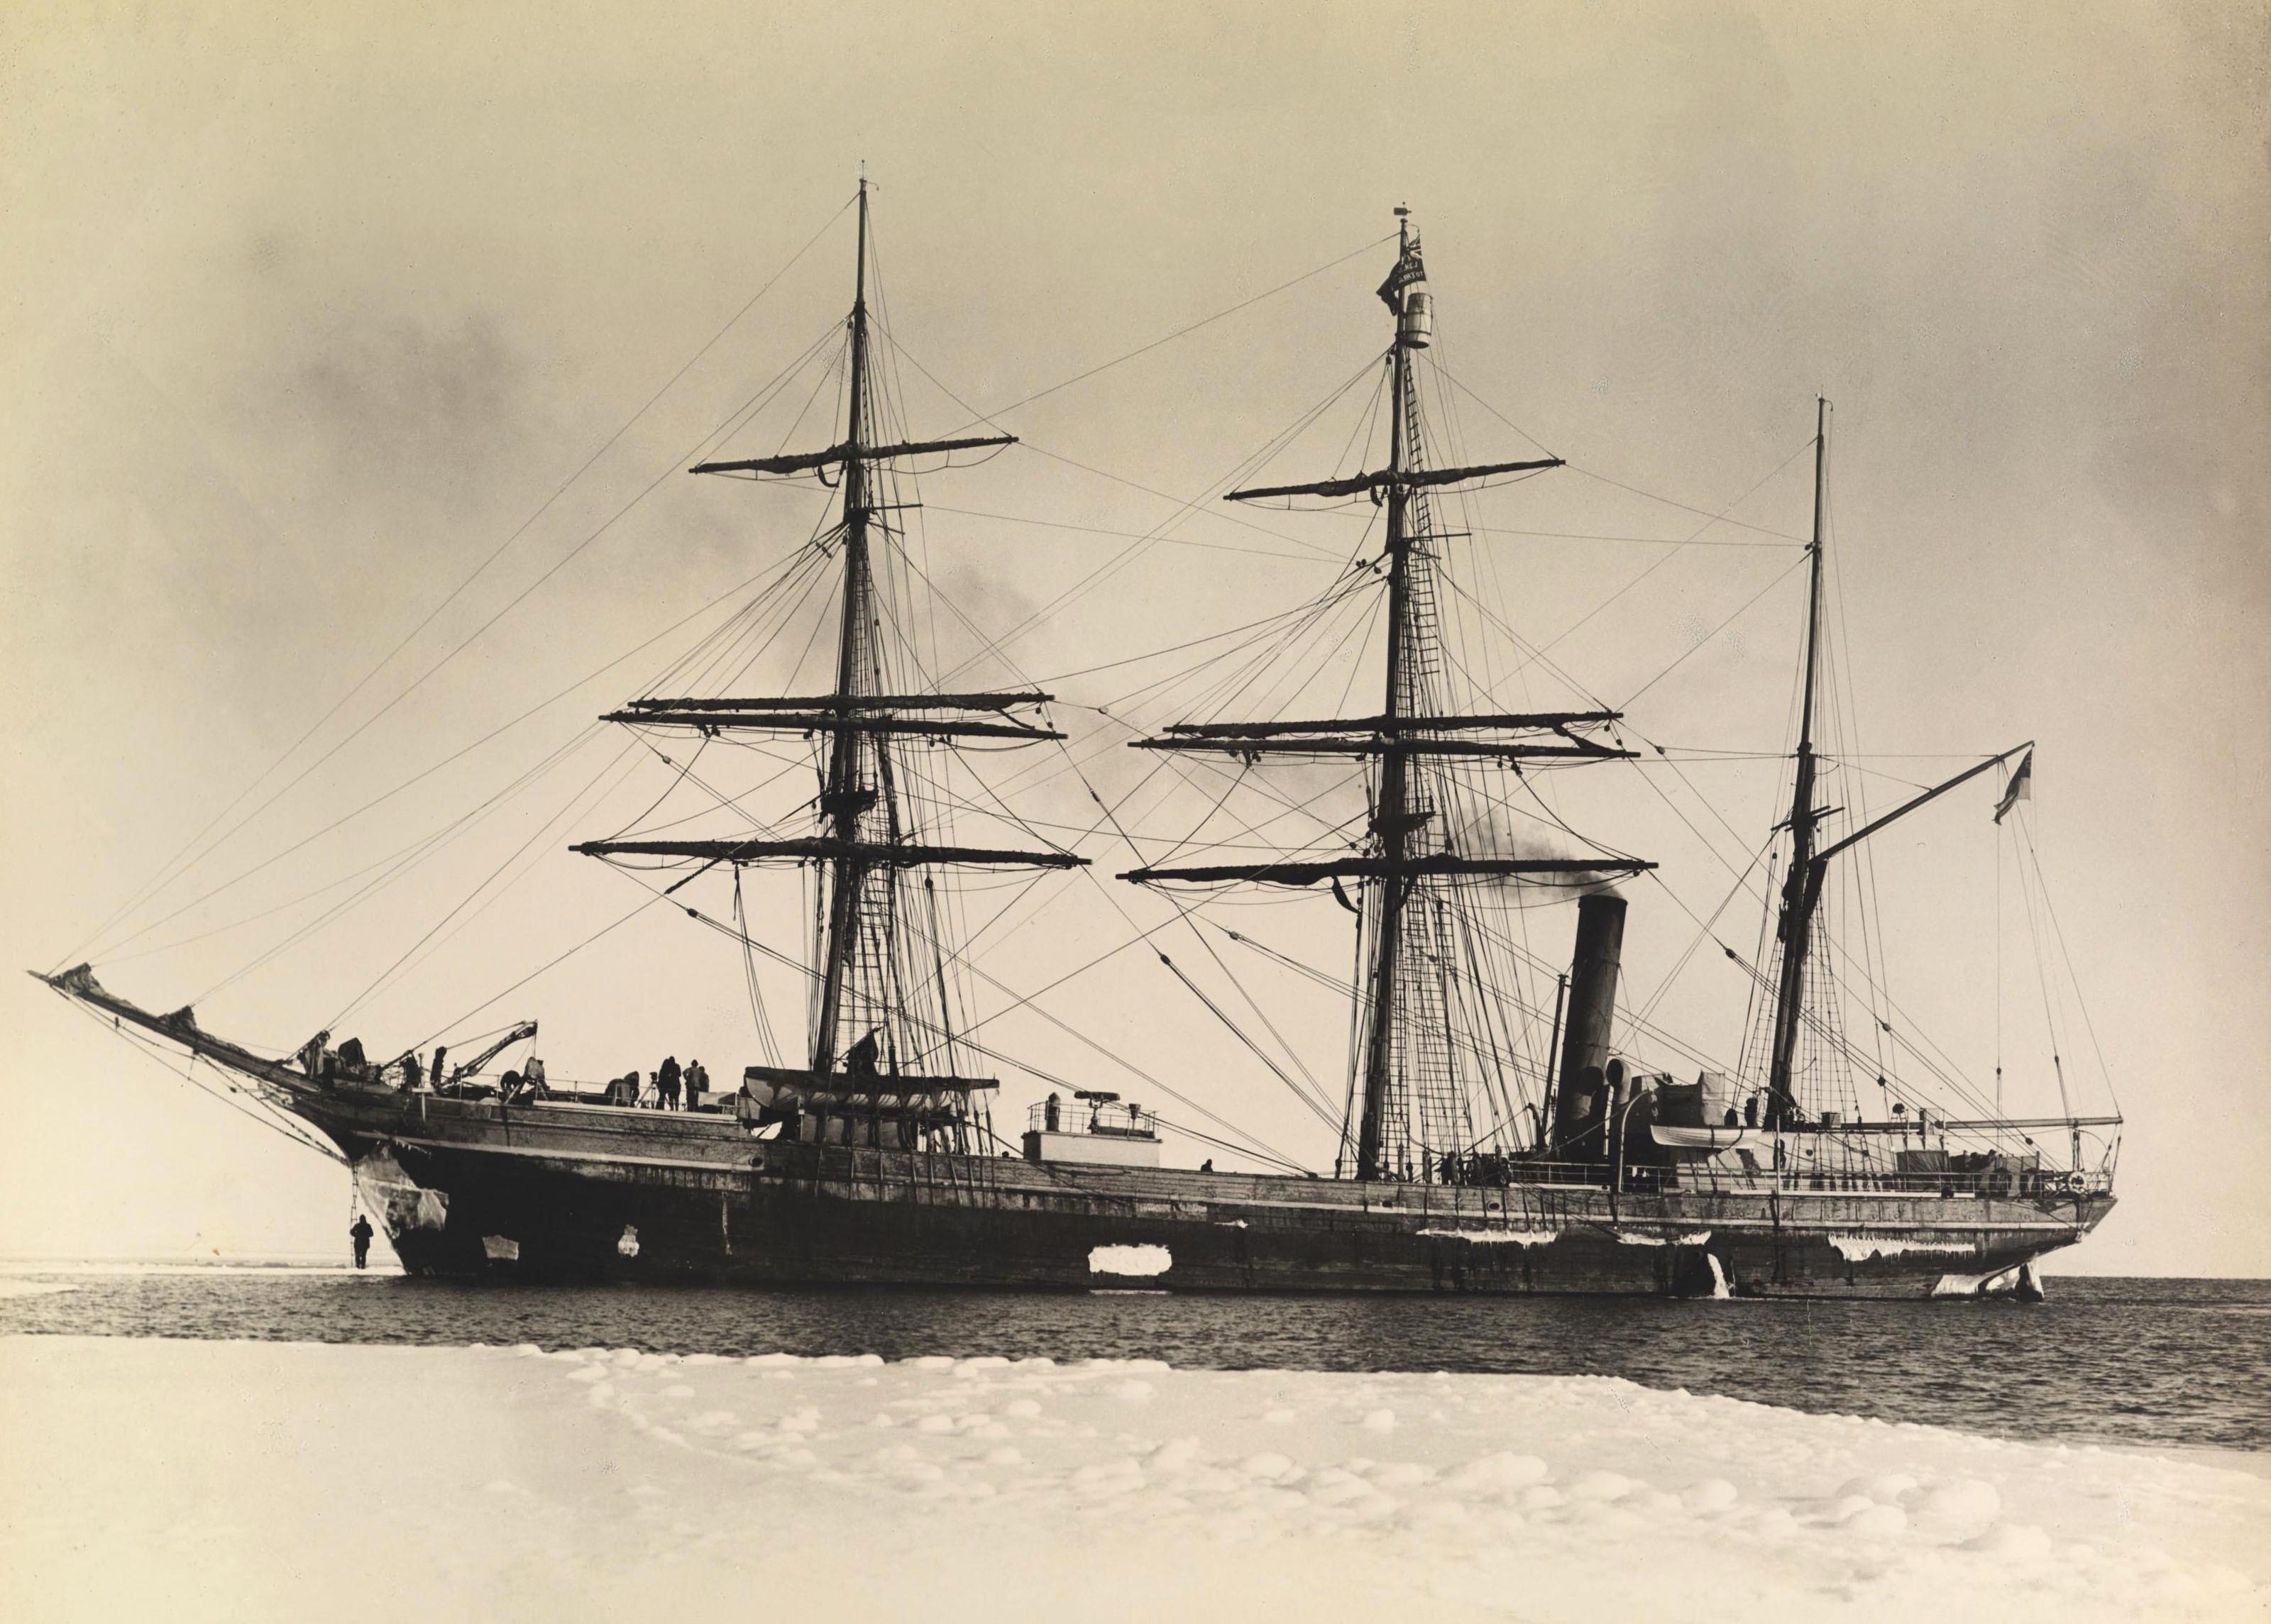 Terra_Nova_ship_by_Herbert_Ponting,_1911